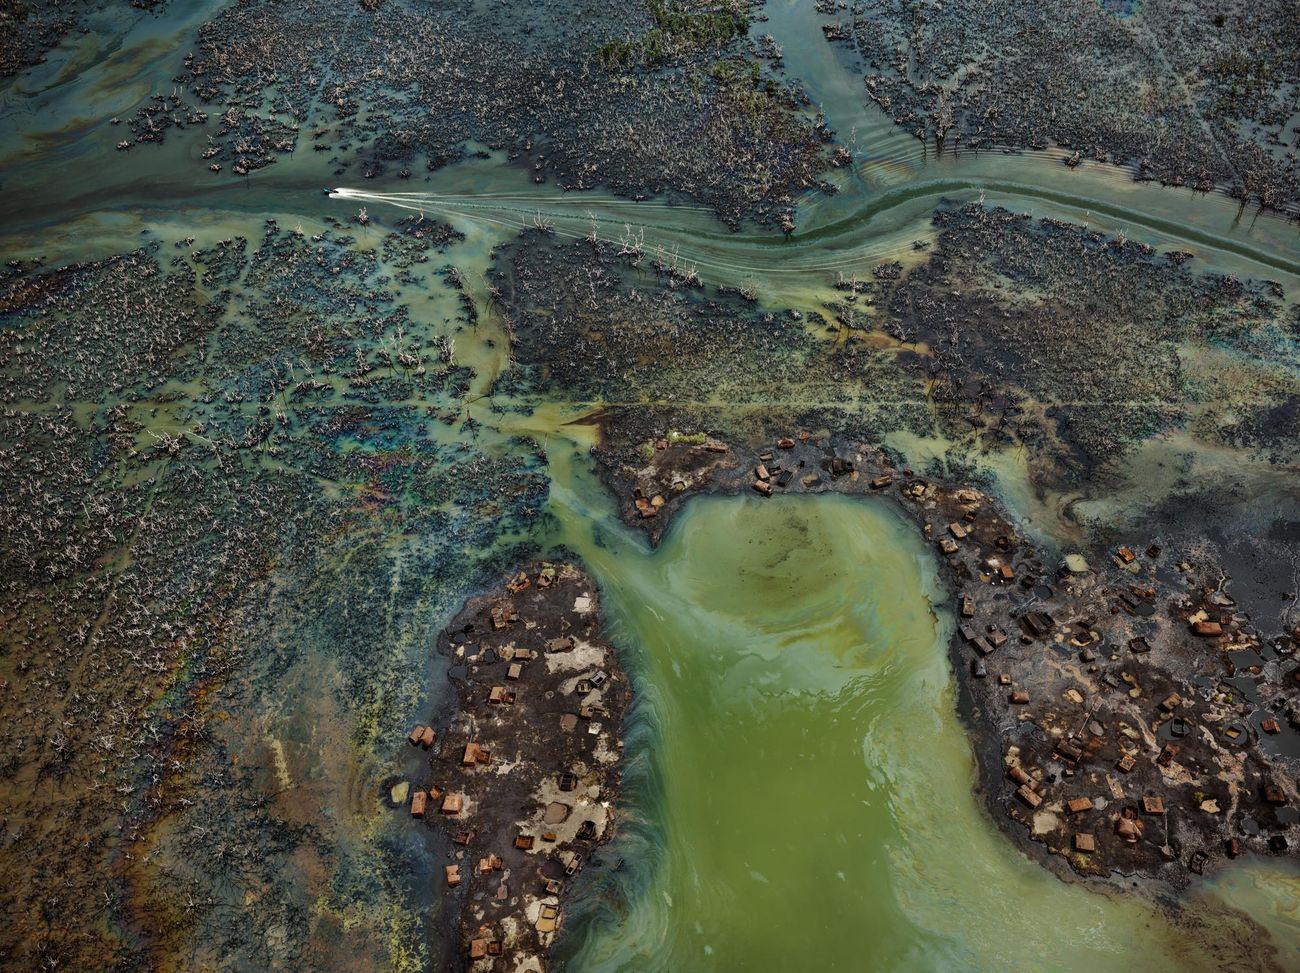 Edward Burtynsky, Oil Bunkering #4, Niger Delta, Nigeria, 2016 © Edward Burtynsky. Courtesy Admira Photography, Milano & Nicholas Metivier Gallery, Toronto